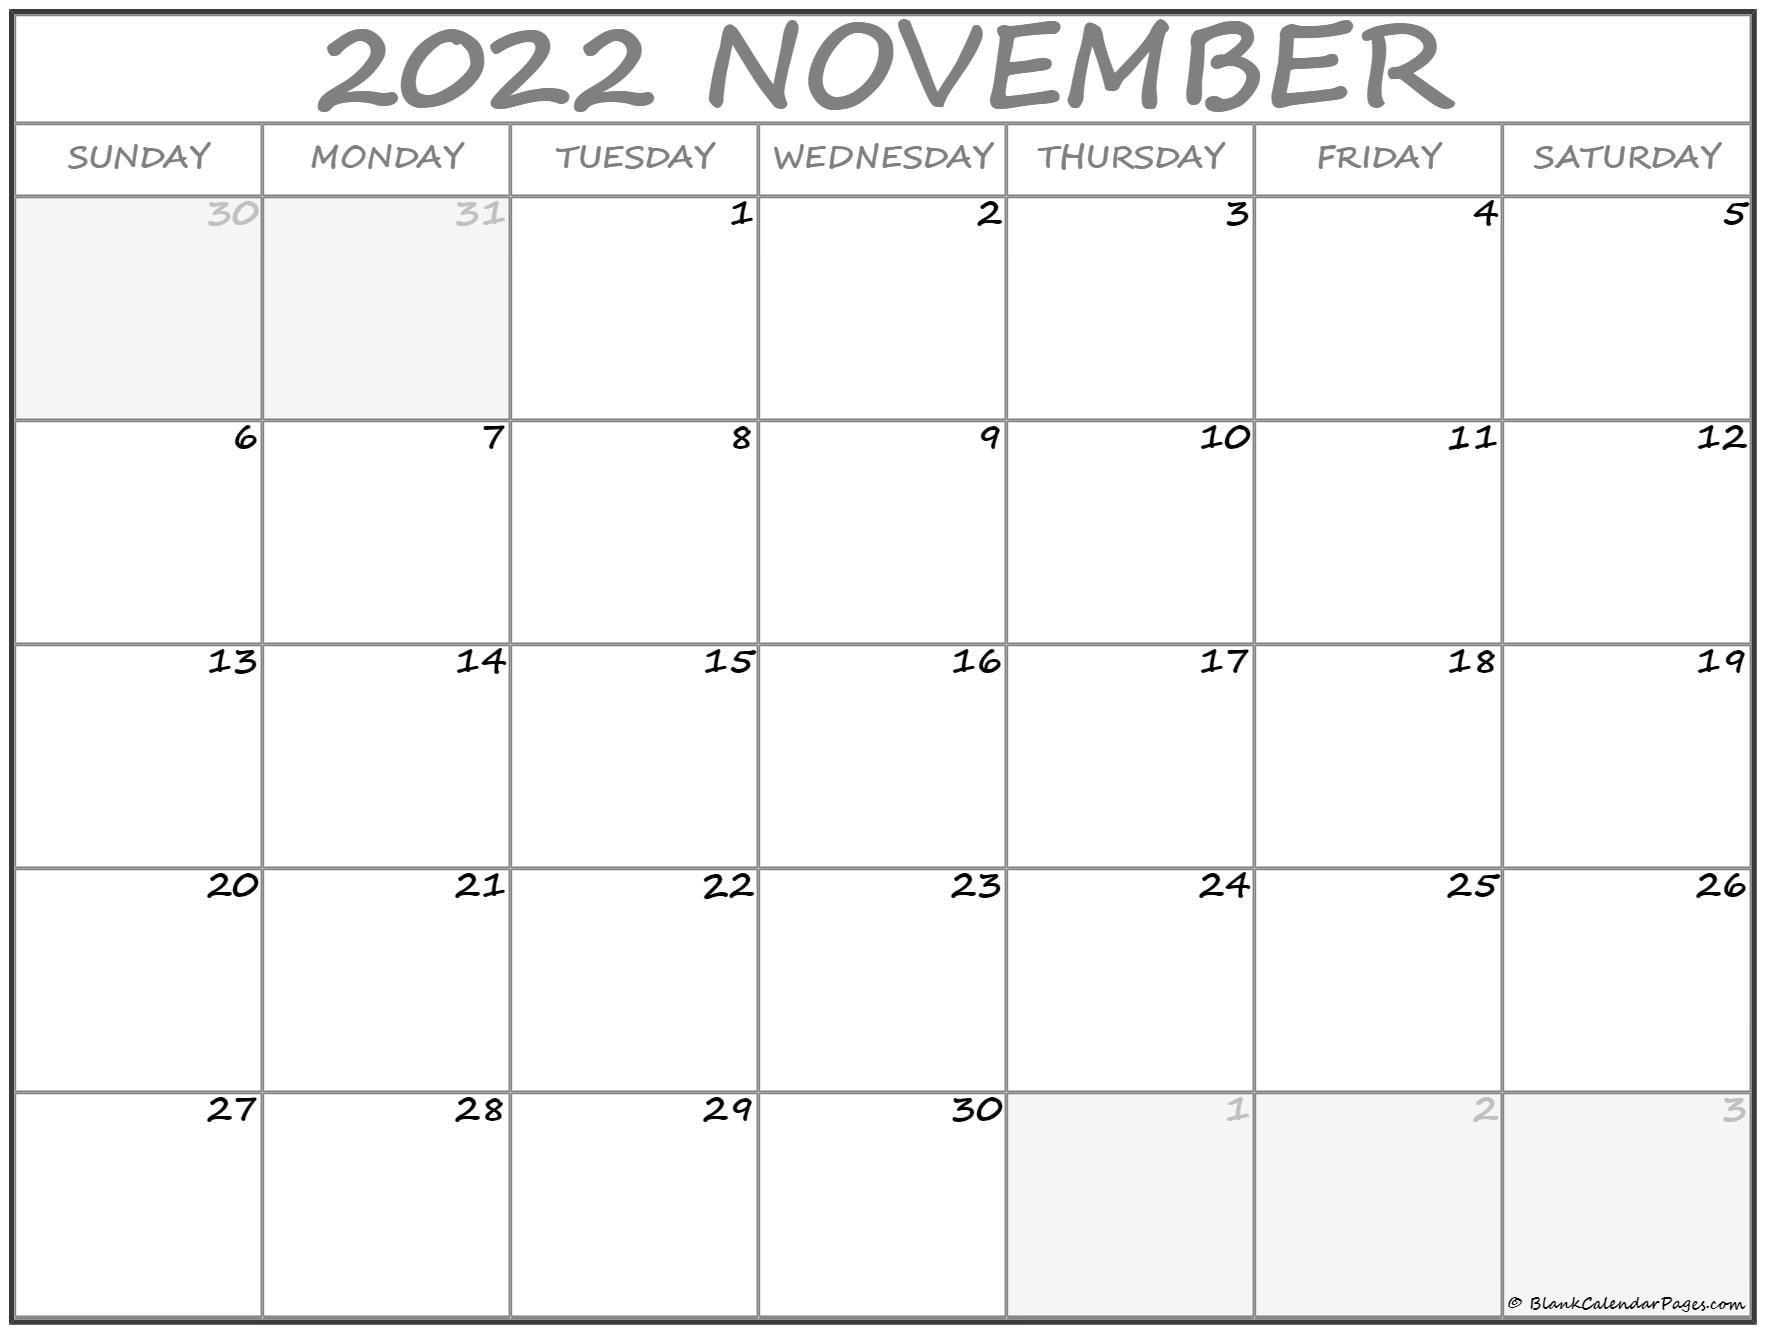 November 2022 calendar | free printable monthly calendars